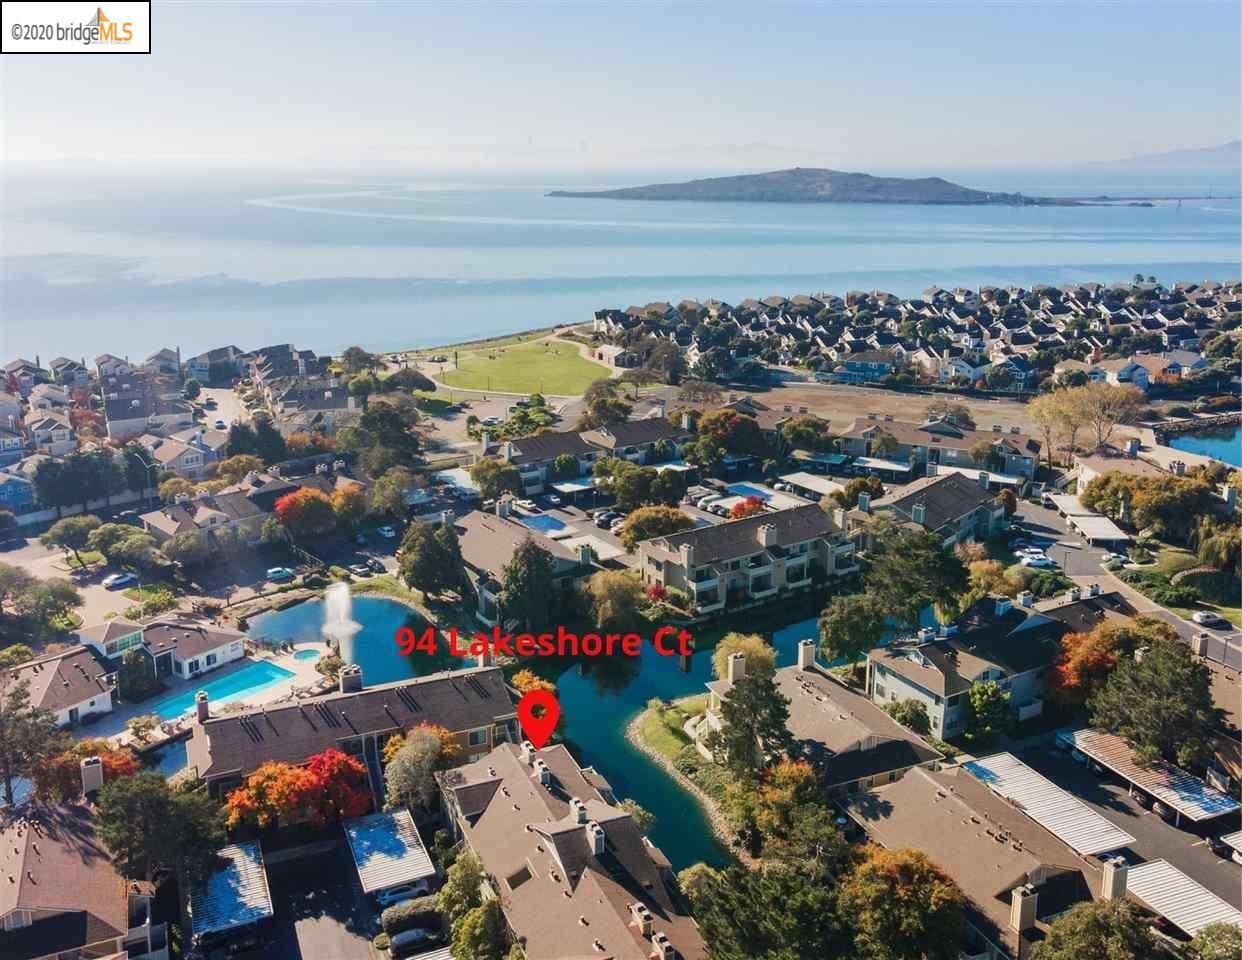 Photo for 94 Lakeshore Ct, RICHMOND, CA 94804 (MLS # 40930402)